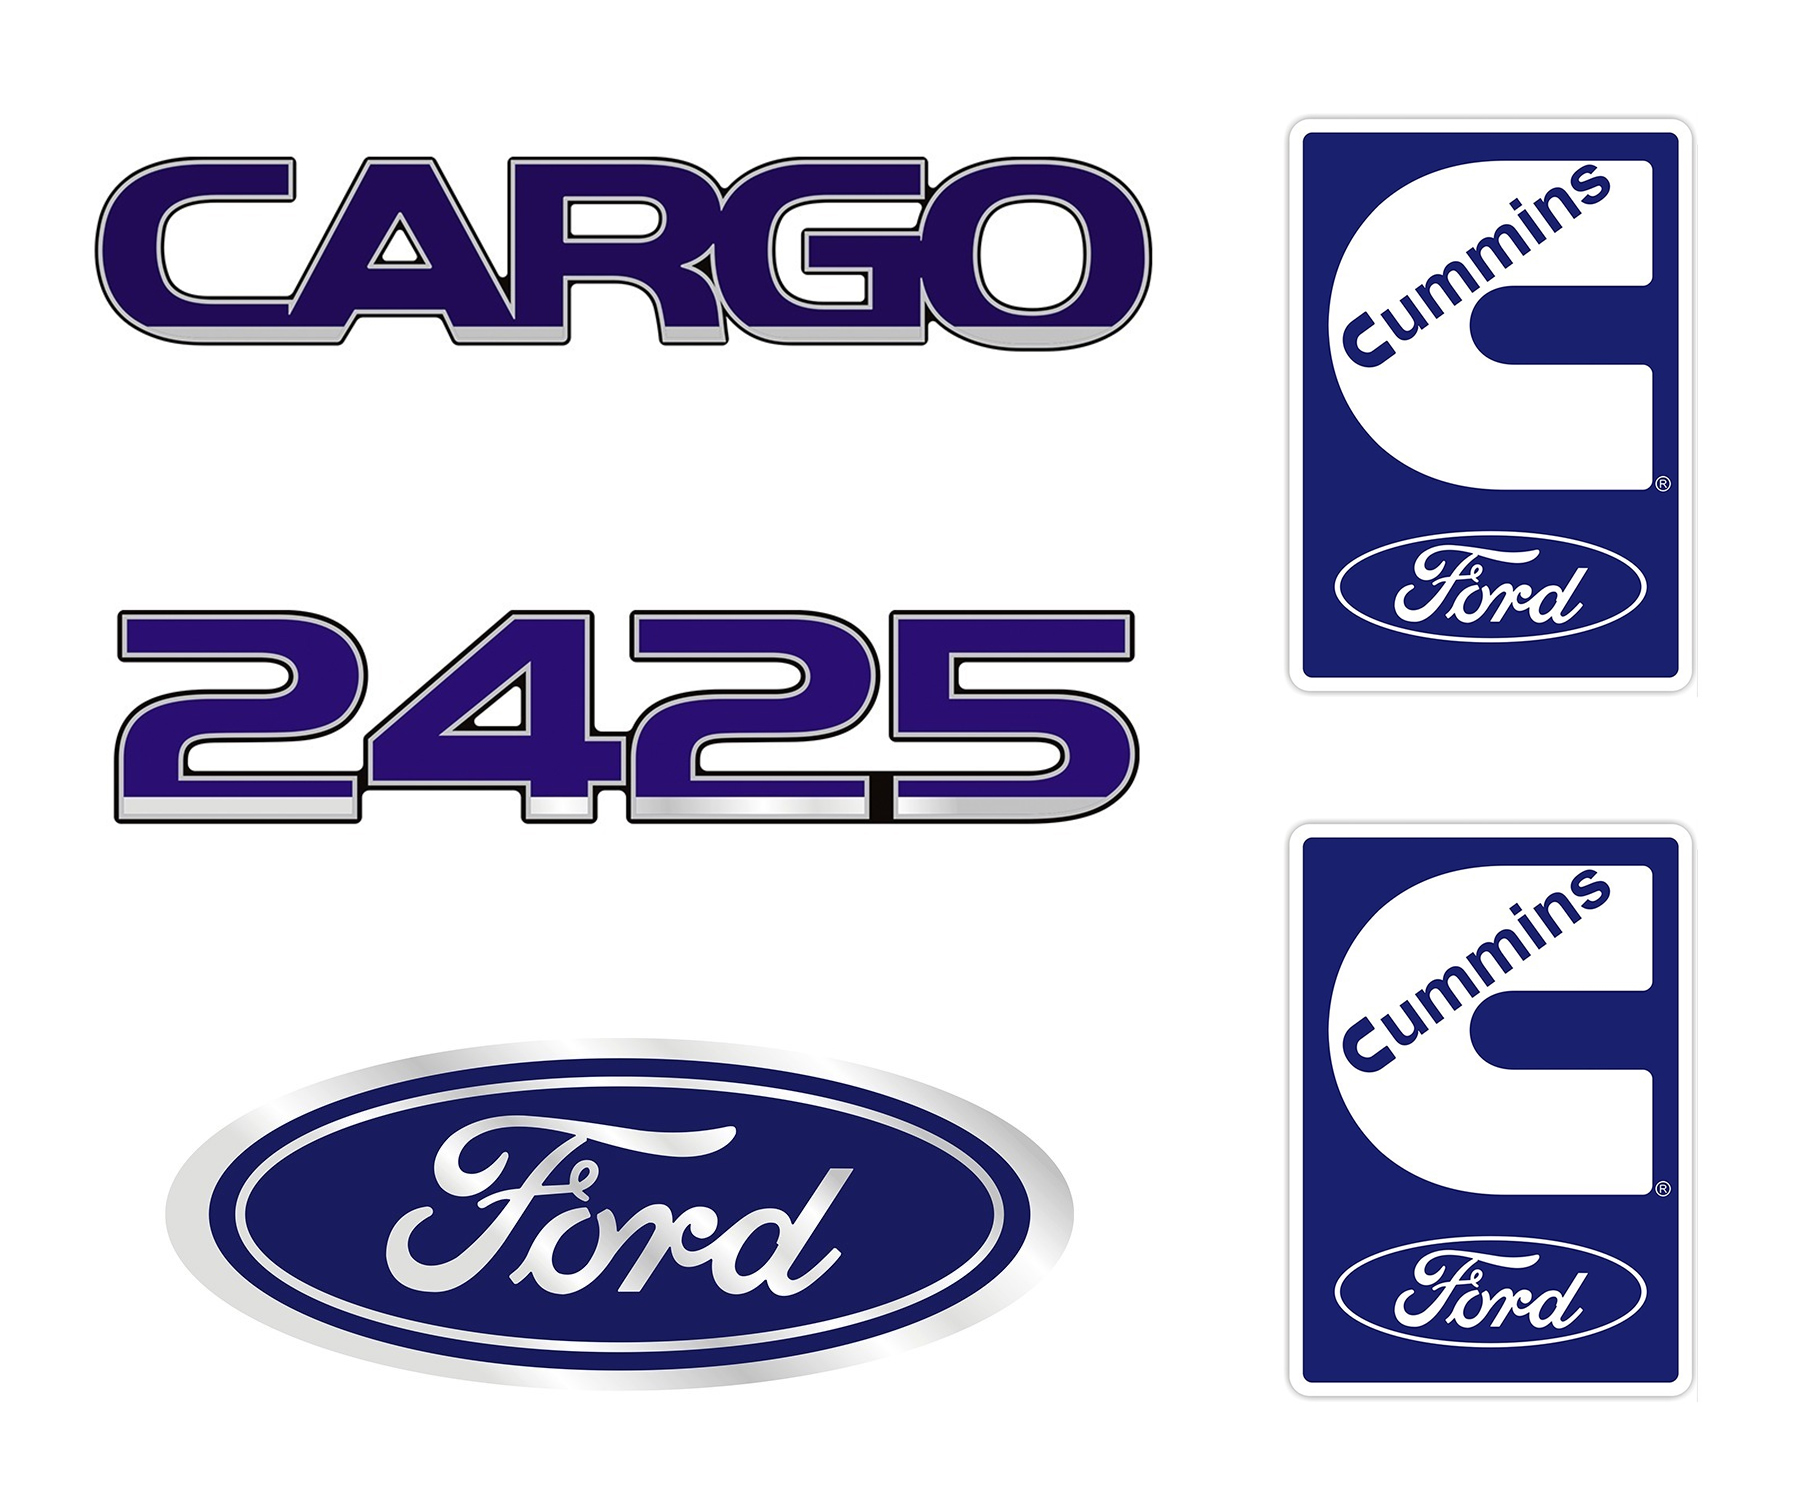 Emblema Ford Cargo 2425 Cummins - Kit